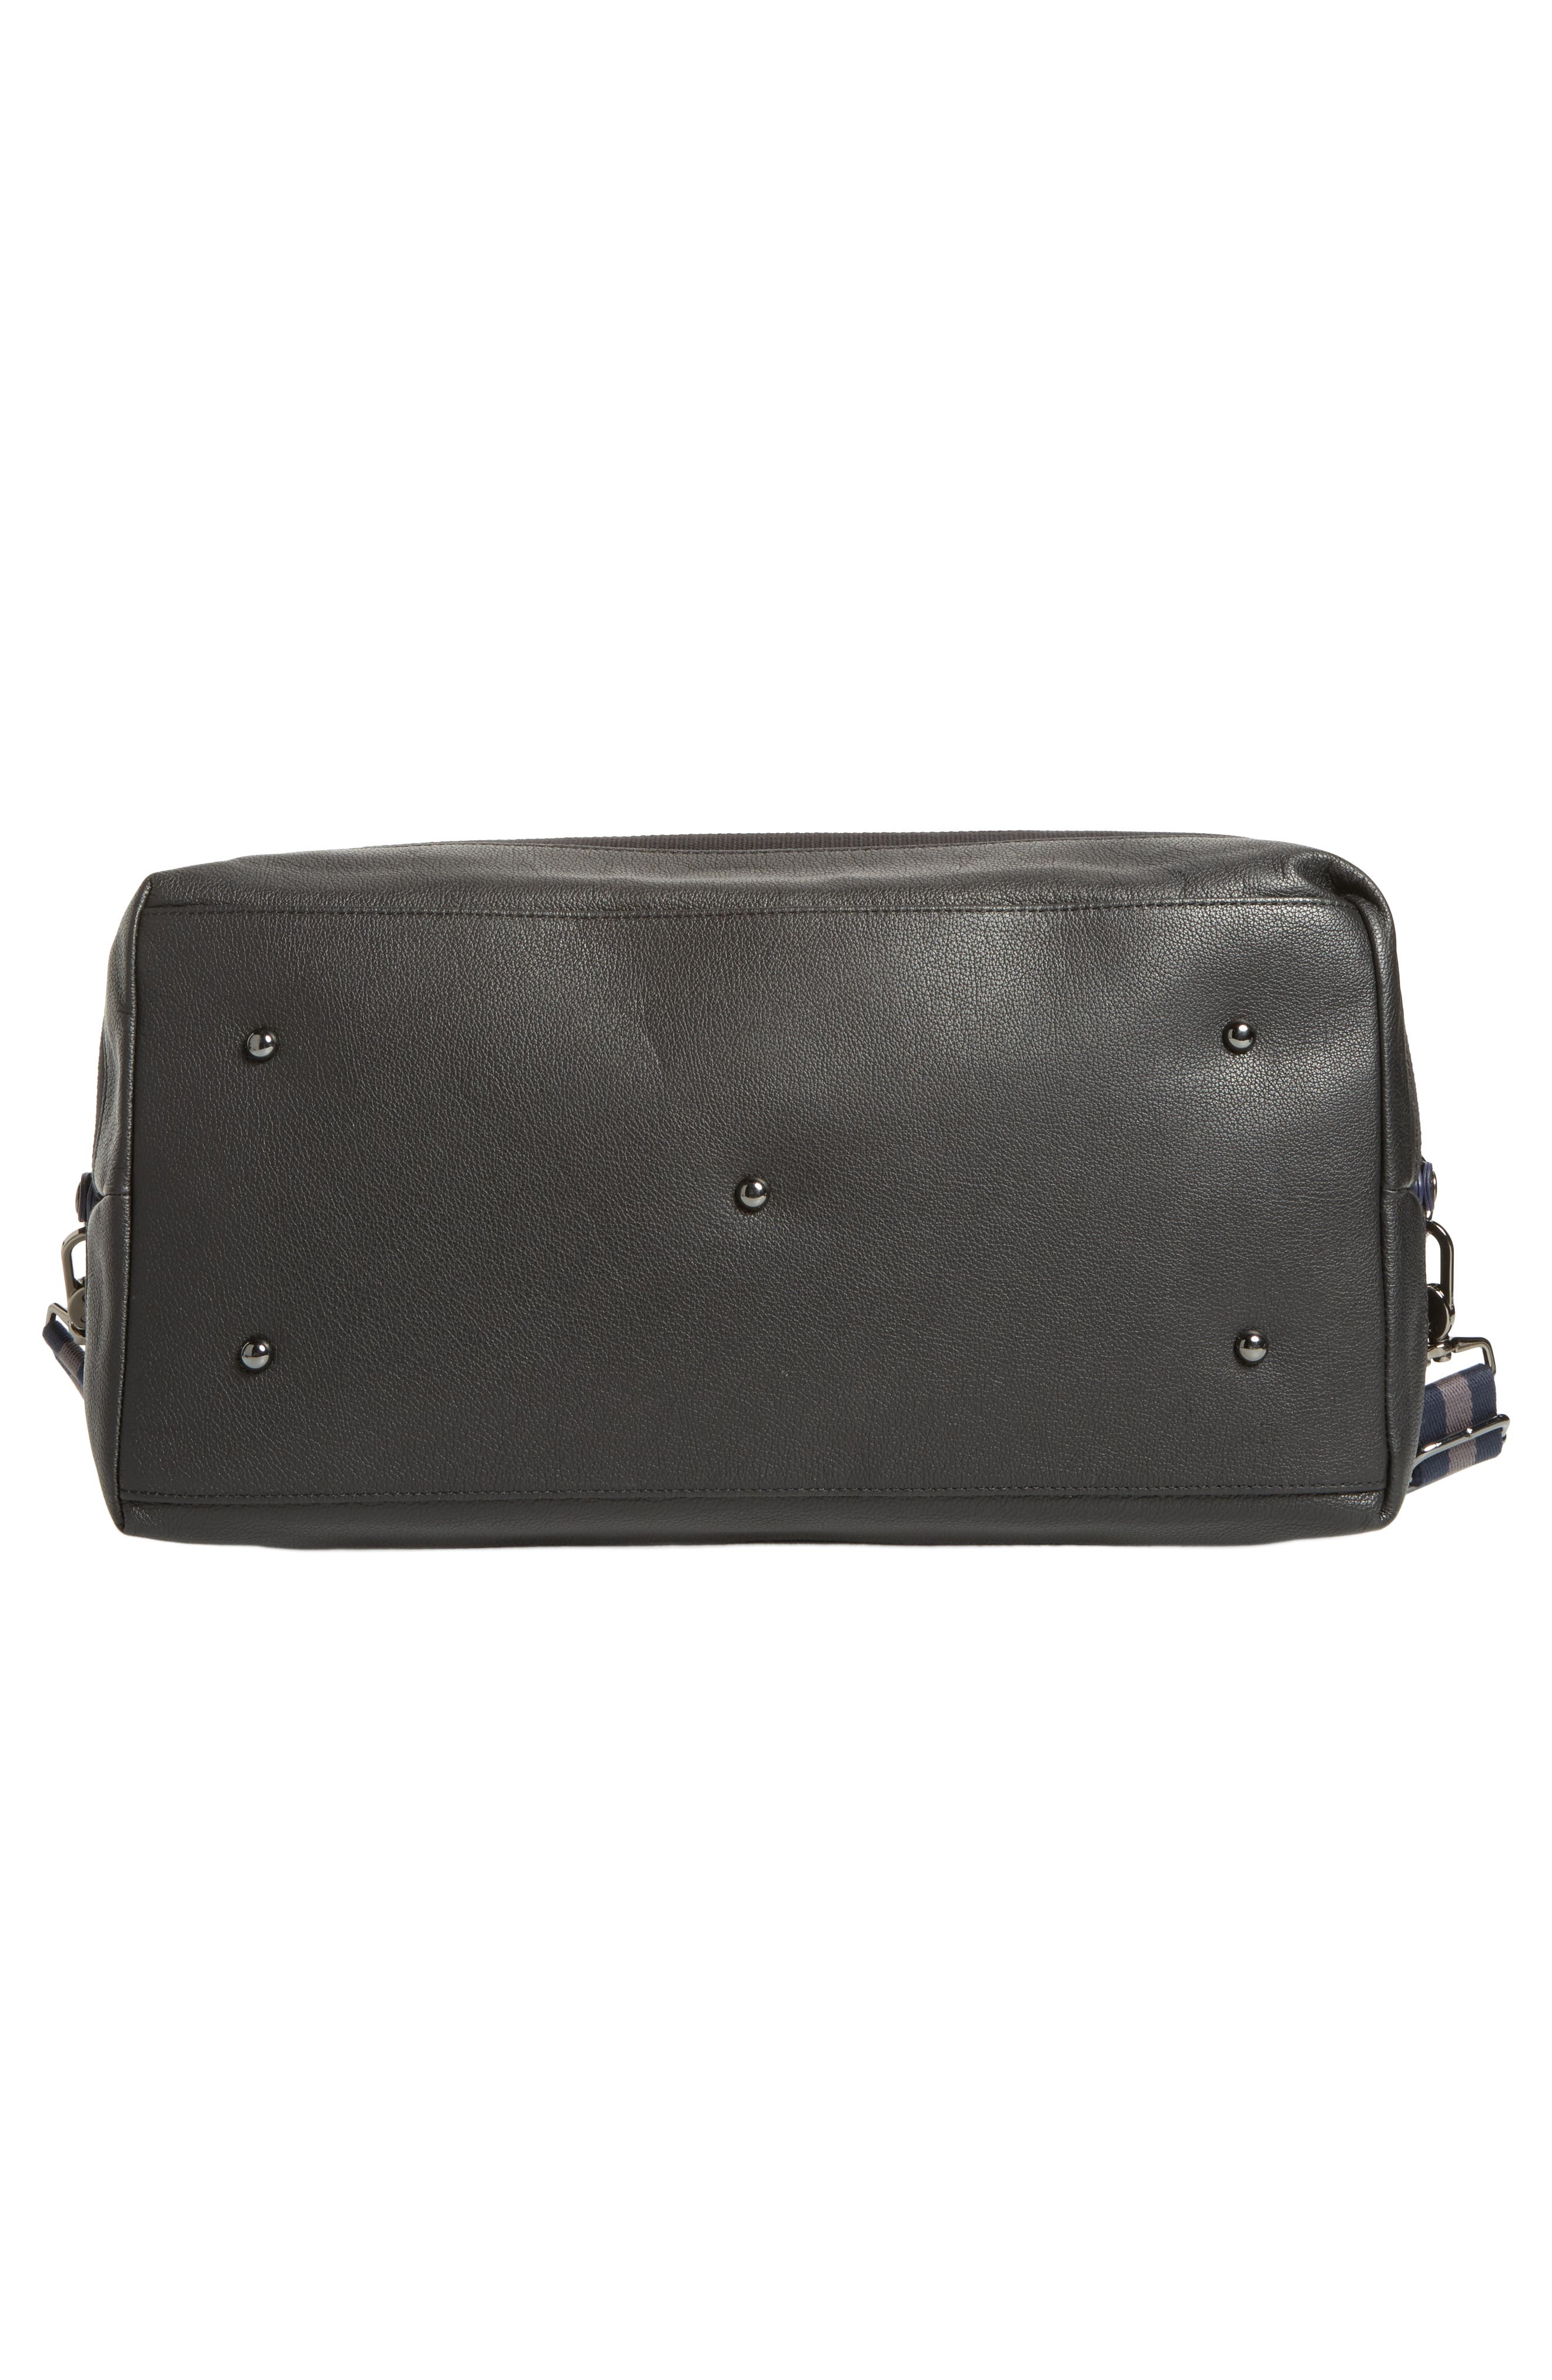 Mylow Duffel Bag,                             Alternate thumbnail 6, color,                             Black